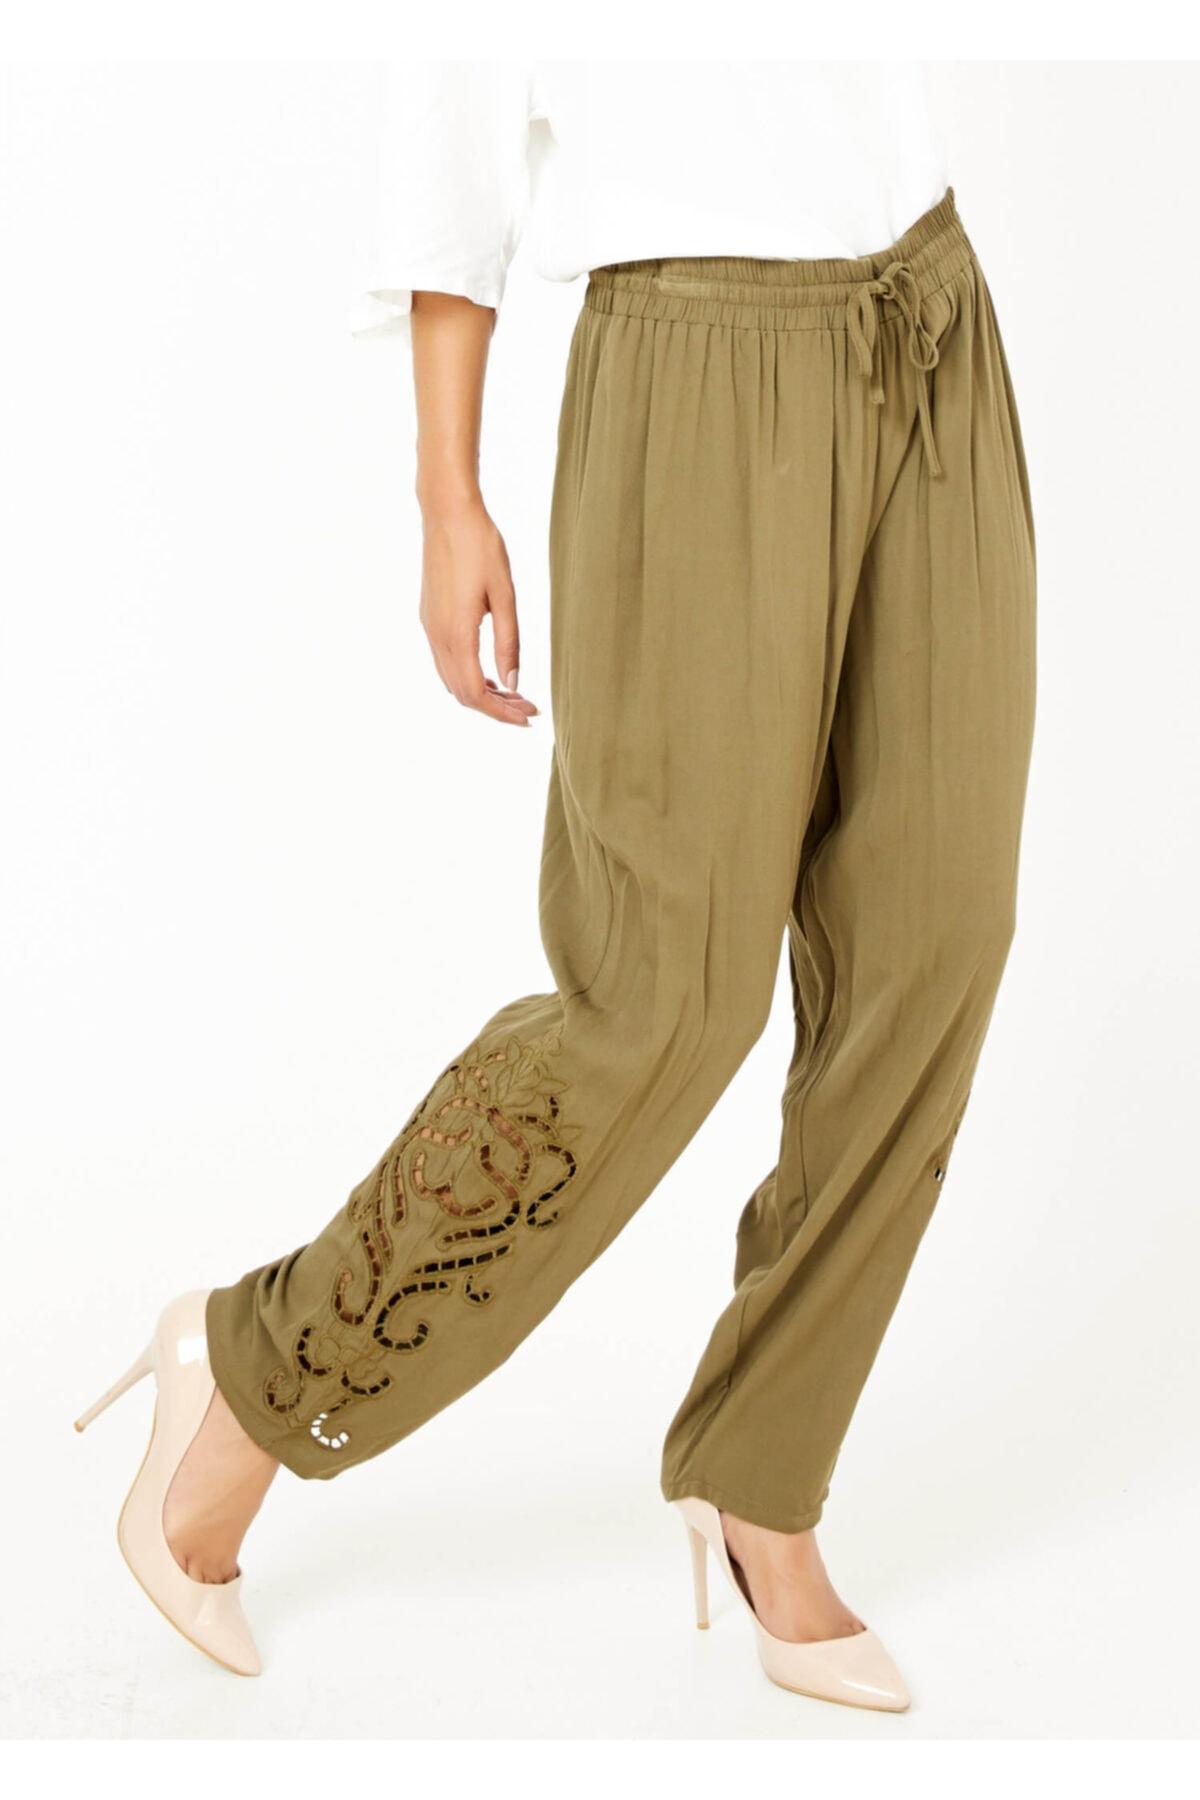 Adze Kadın Haki Paça Detaylı Bel Lastikli Pantolon 1